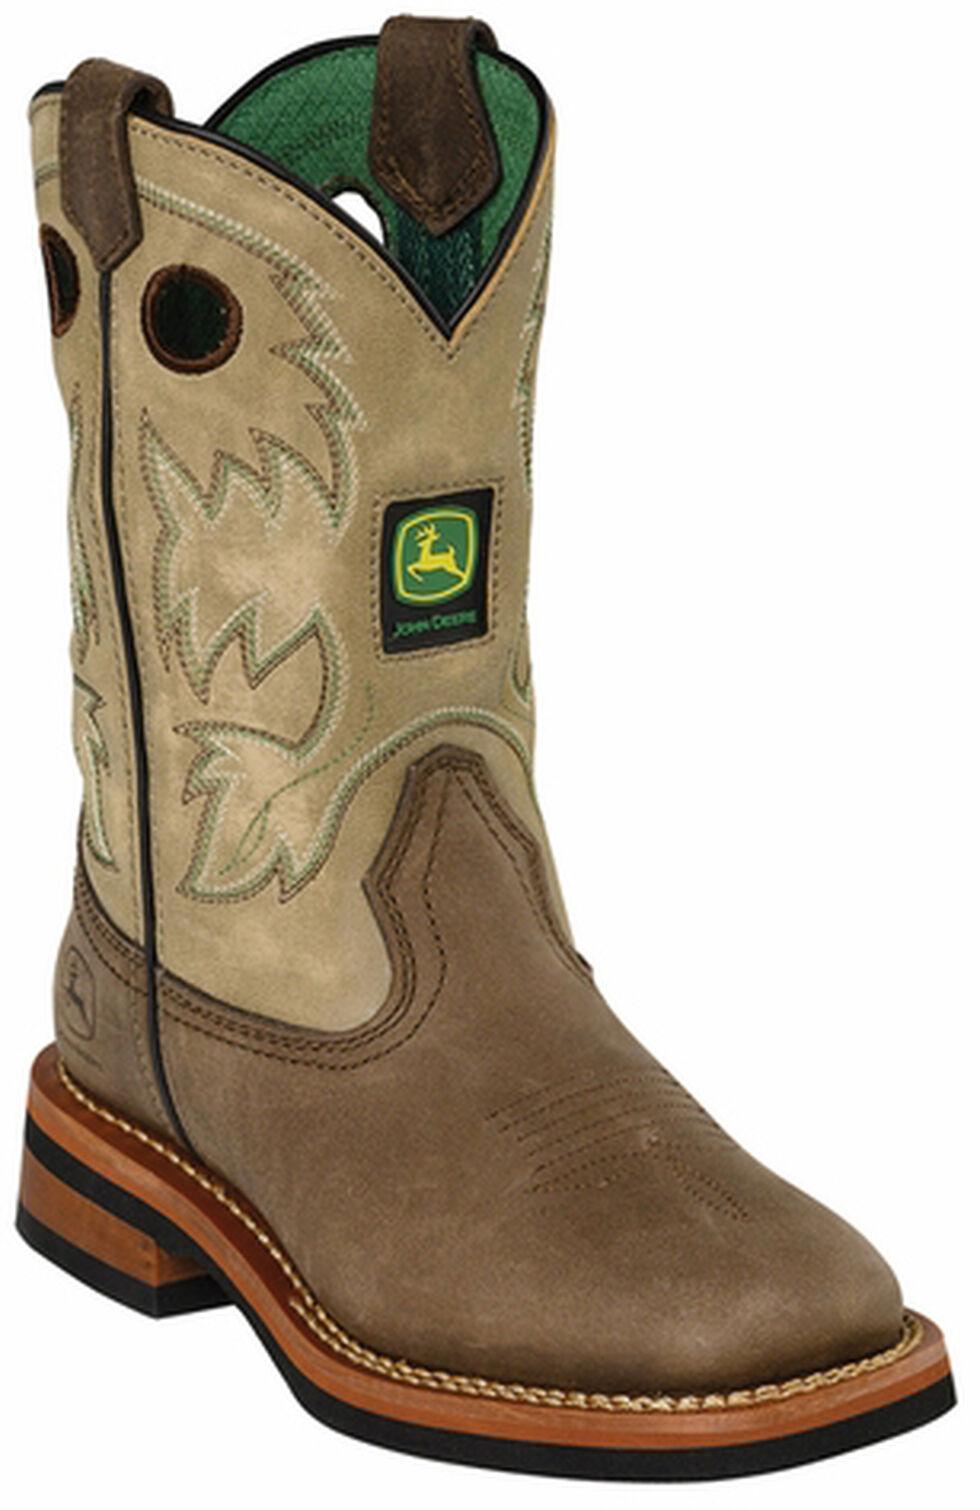 John Deere Boys' Johnny Popper Tan Western Boots - Square Toe, Tan, hi-res